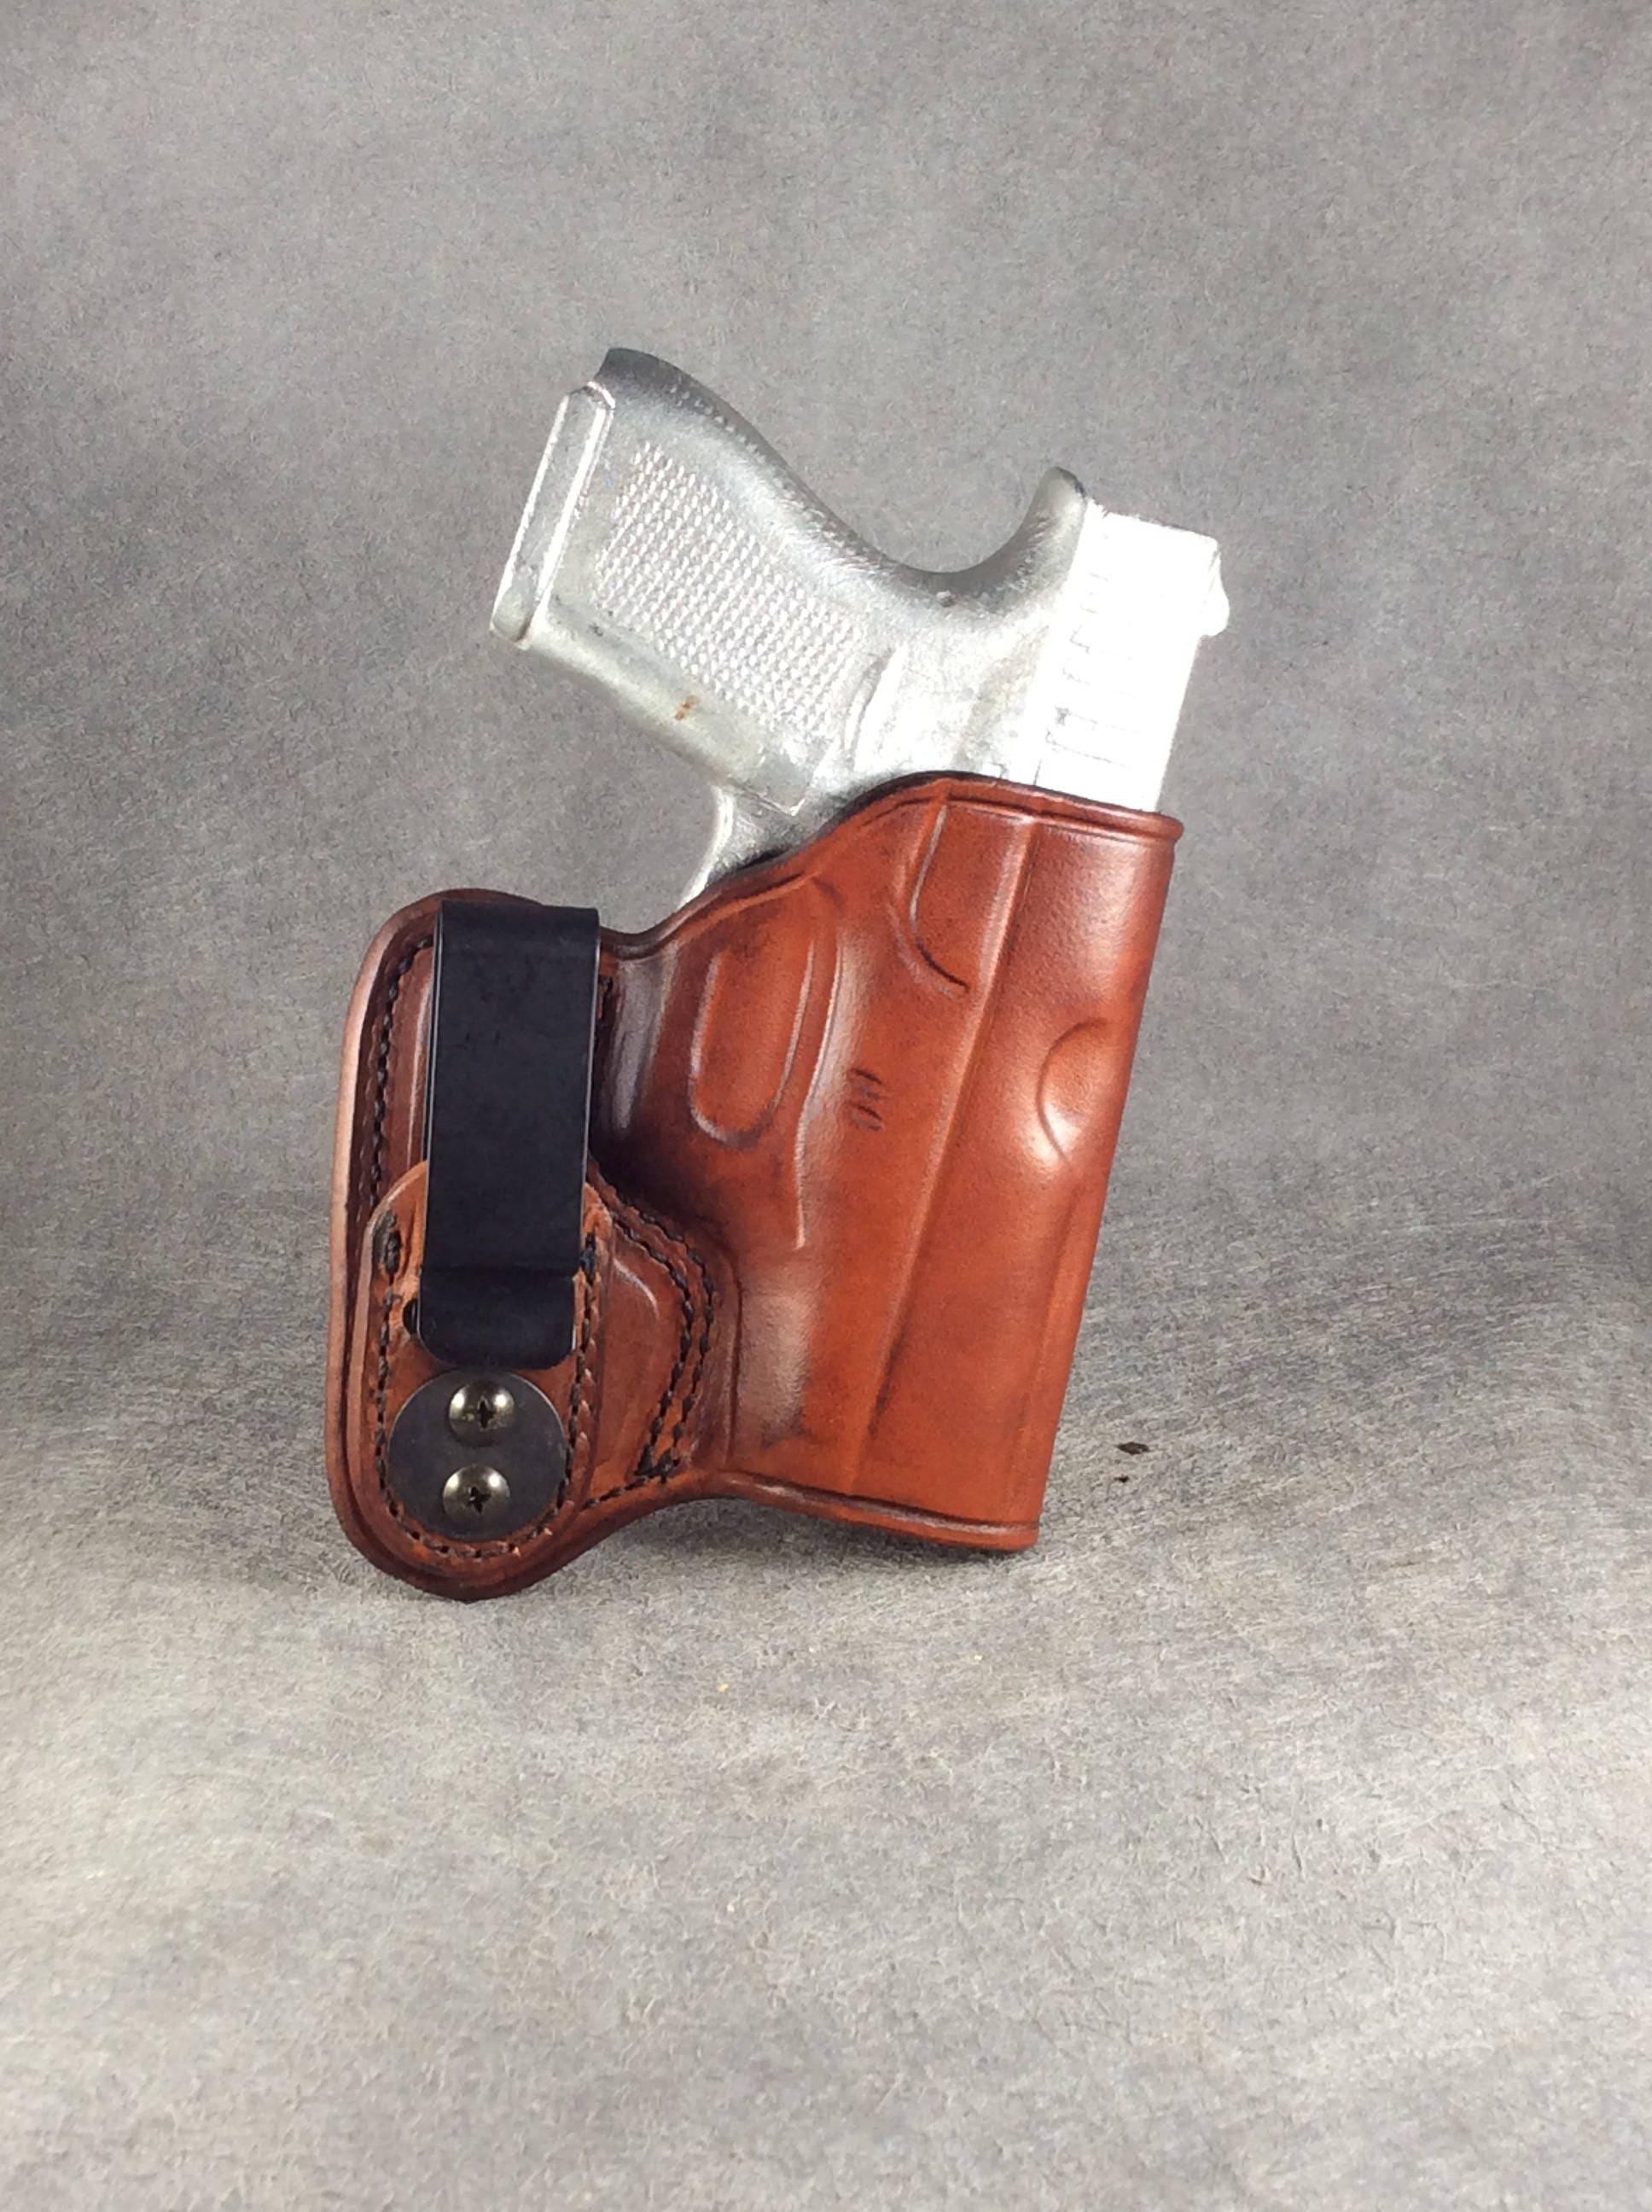 Glock 42 Concealed IWB Leather Gun Holster